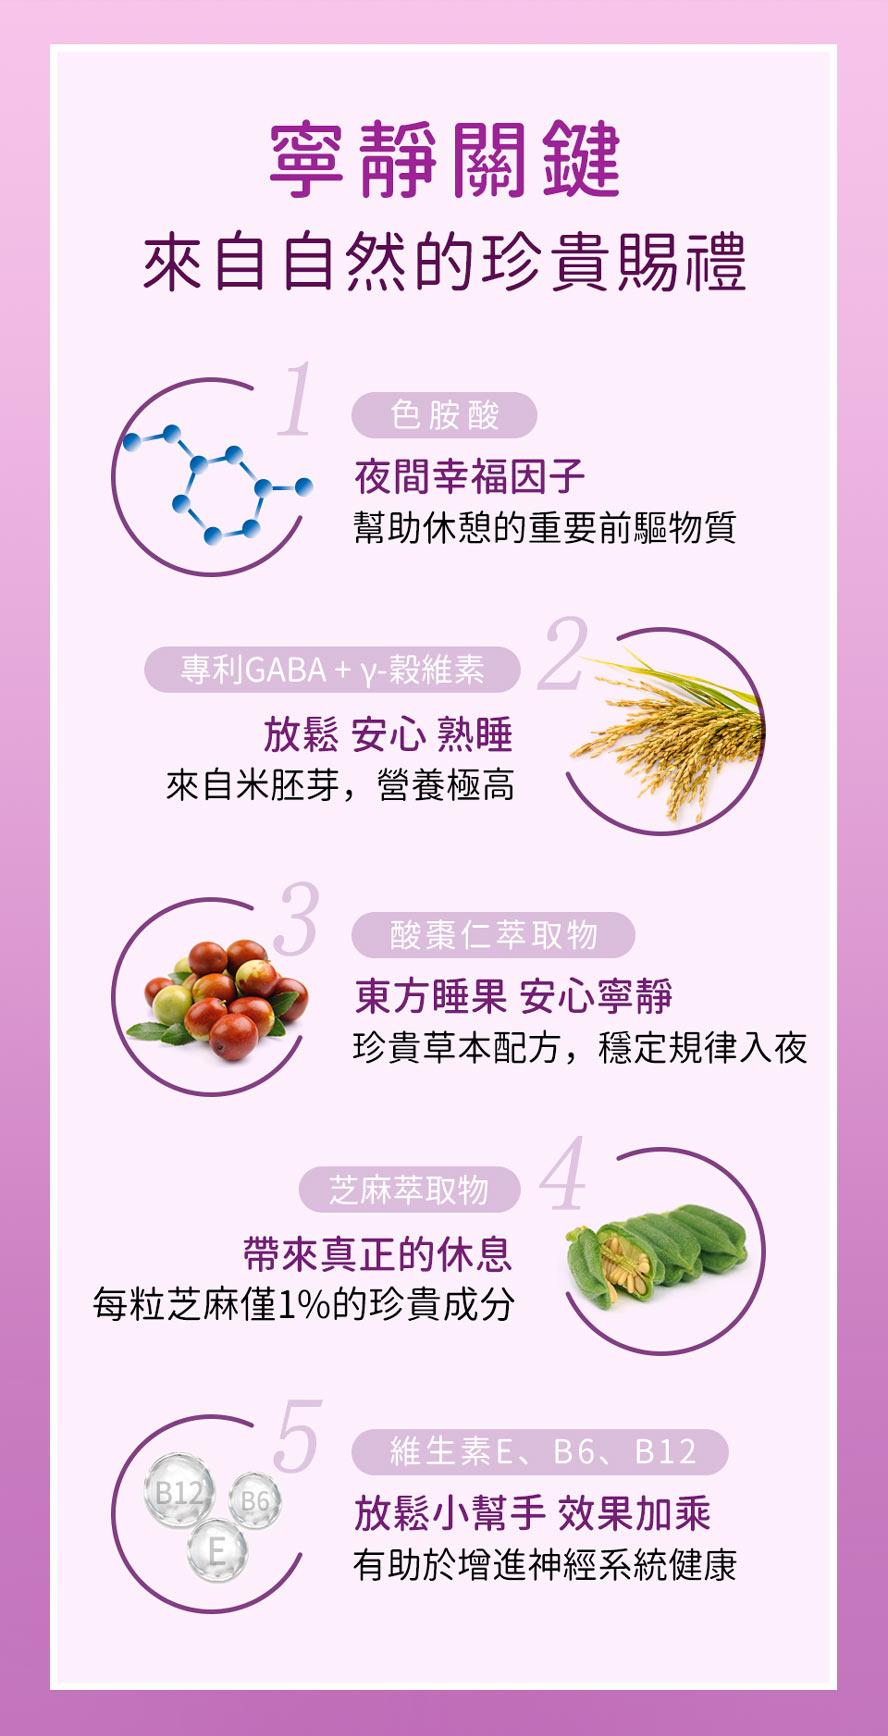 BHKs夜萃EX膠囊採用天然好睡配方,酸棗仁、色胺酸、GABA、穀維素與芝麻醚素。